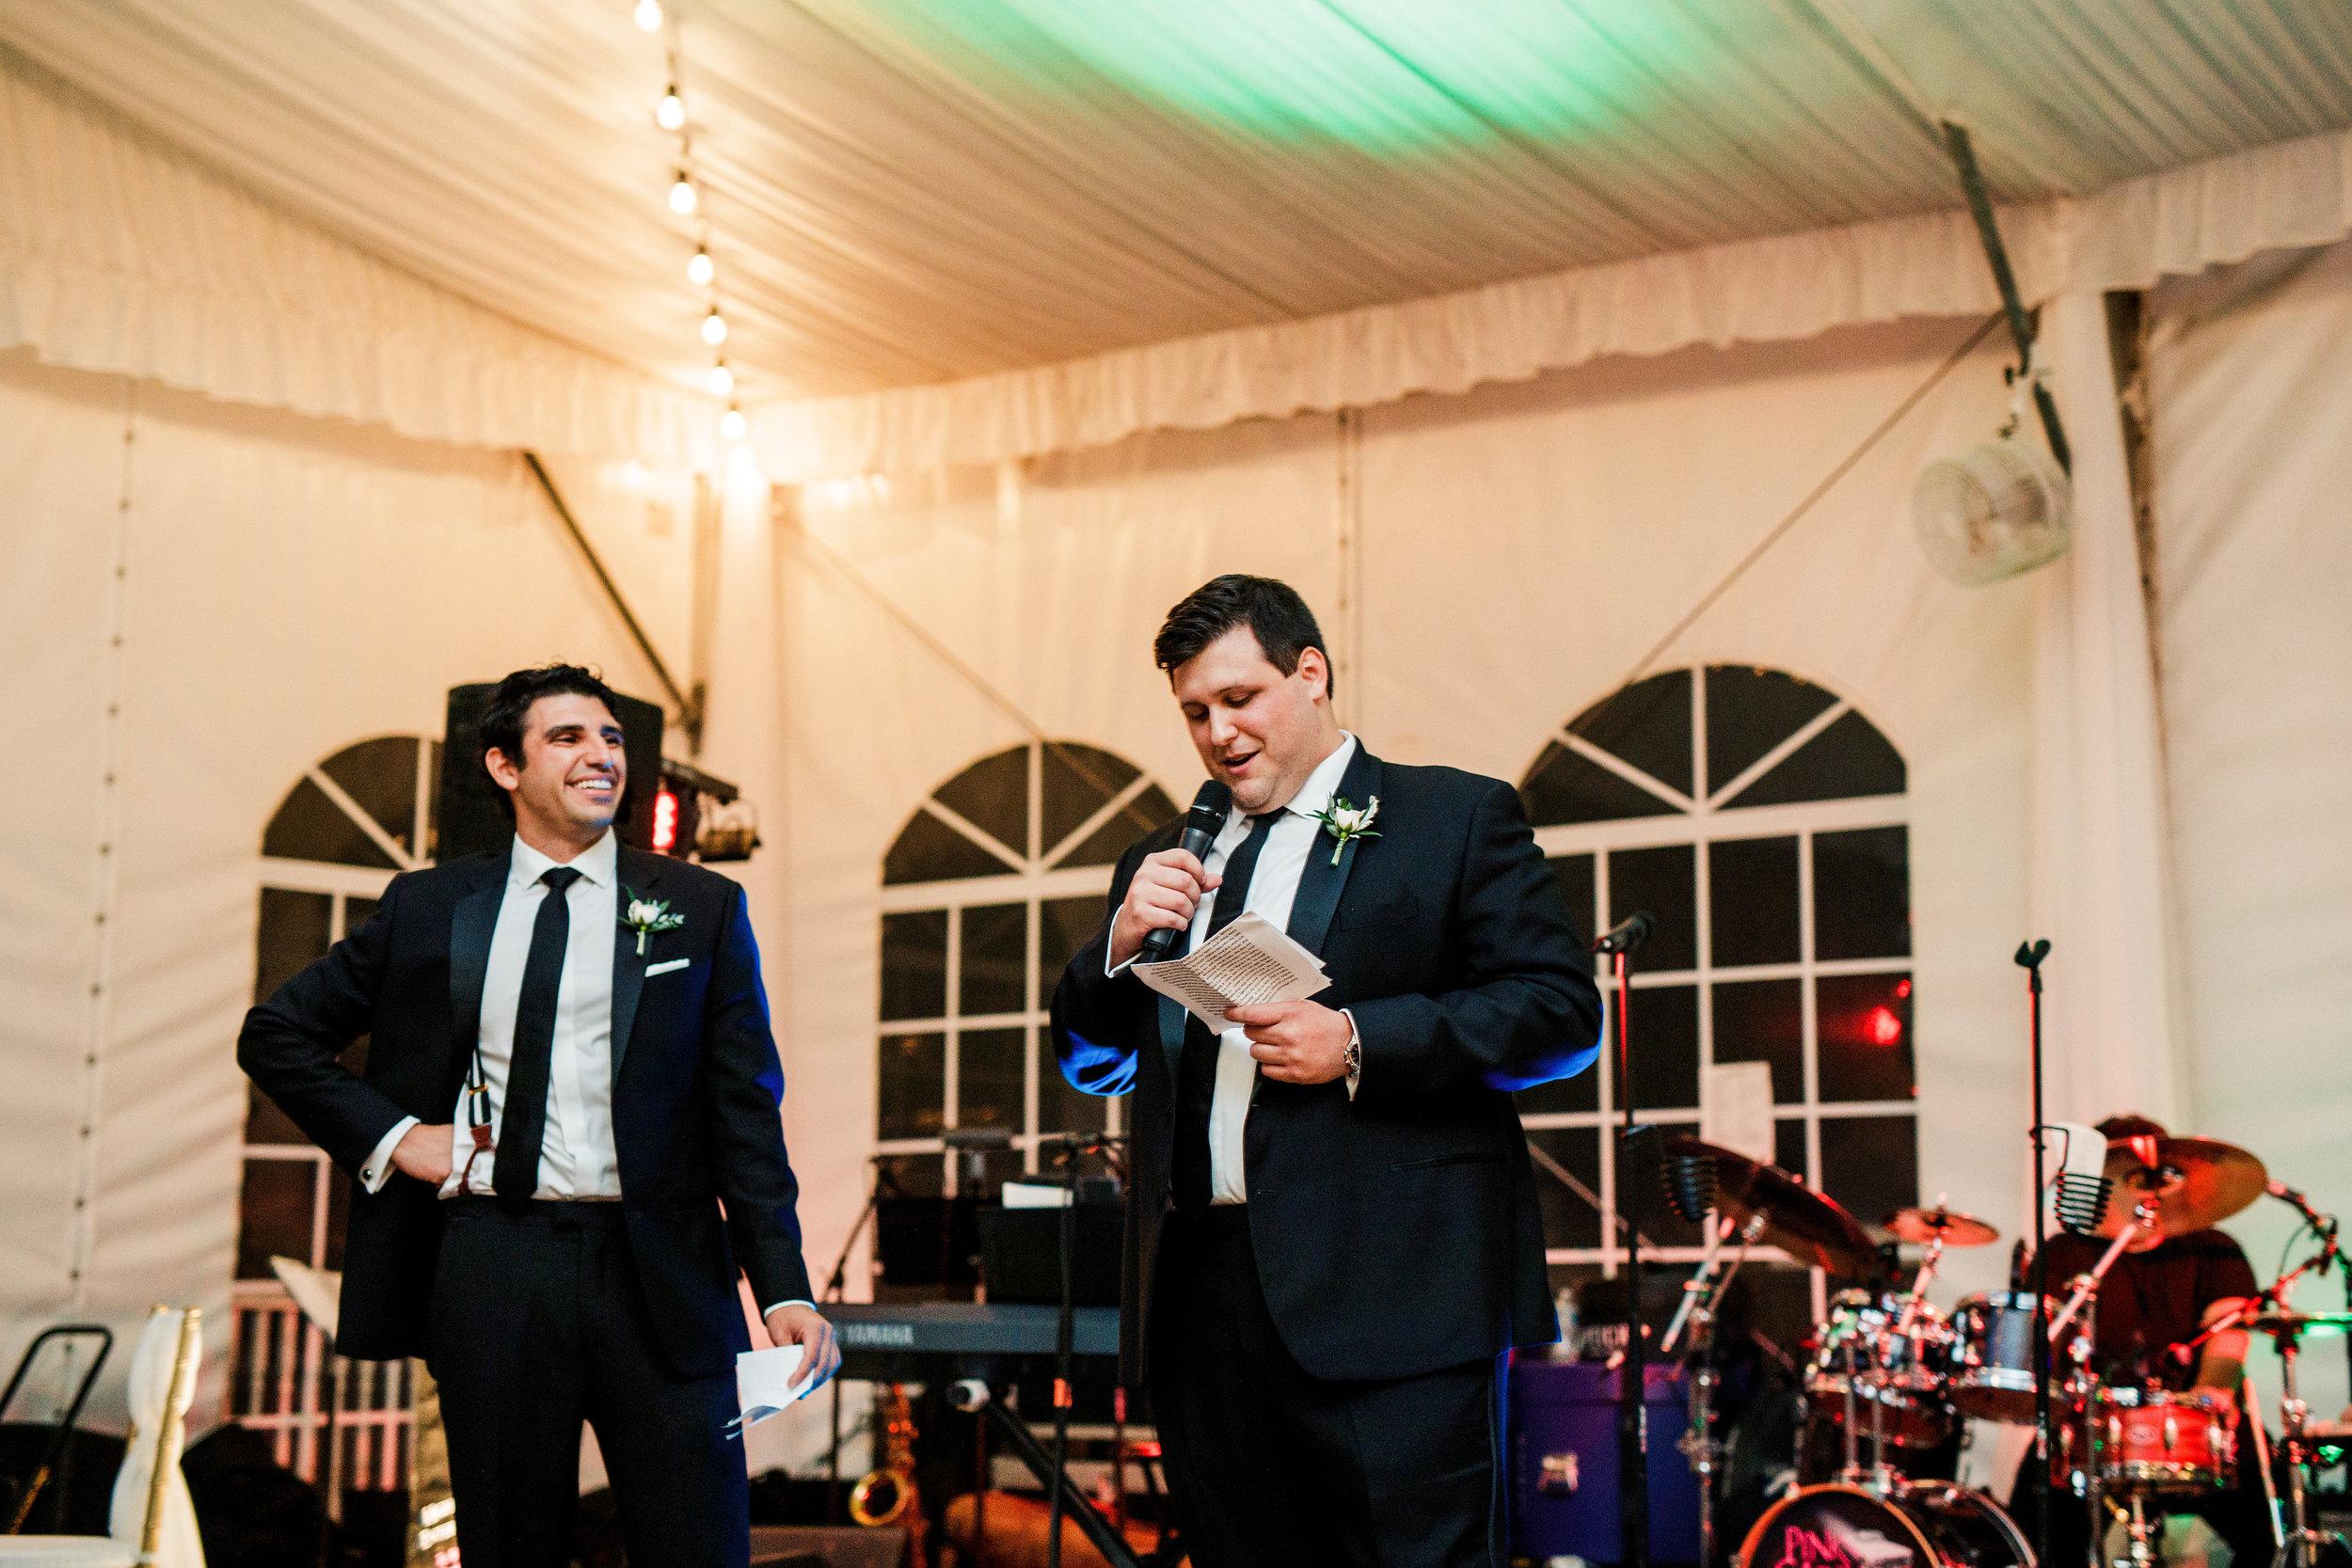 Riverwood-Mansion-Wedding37.jpg